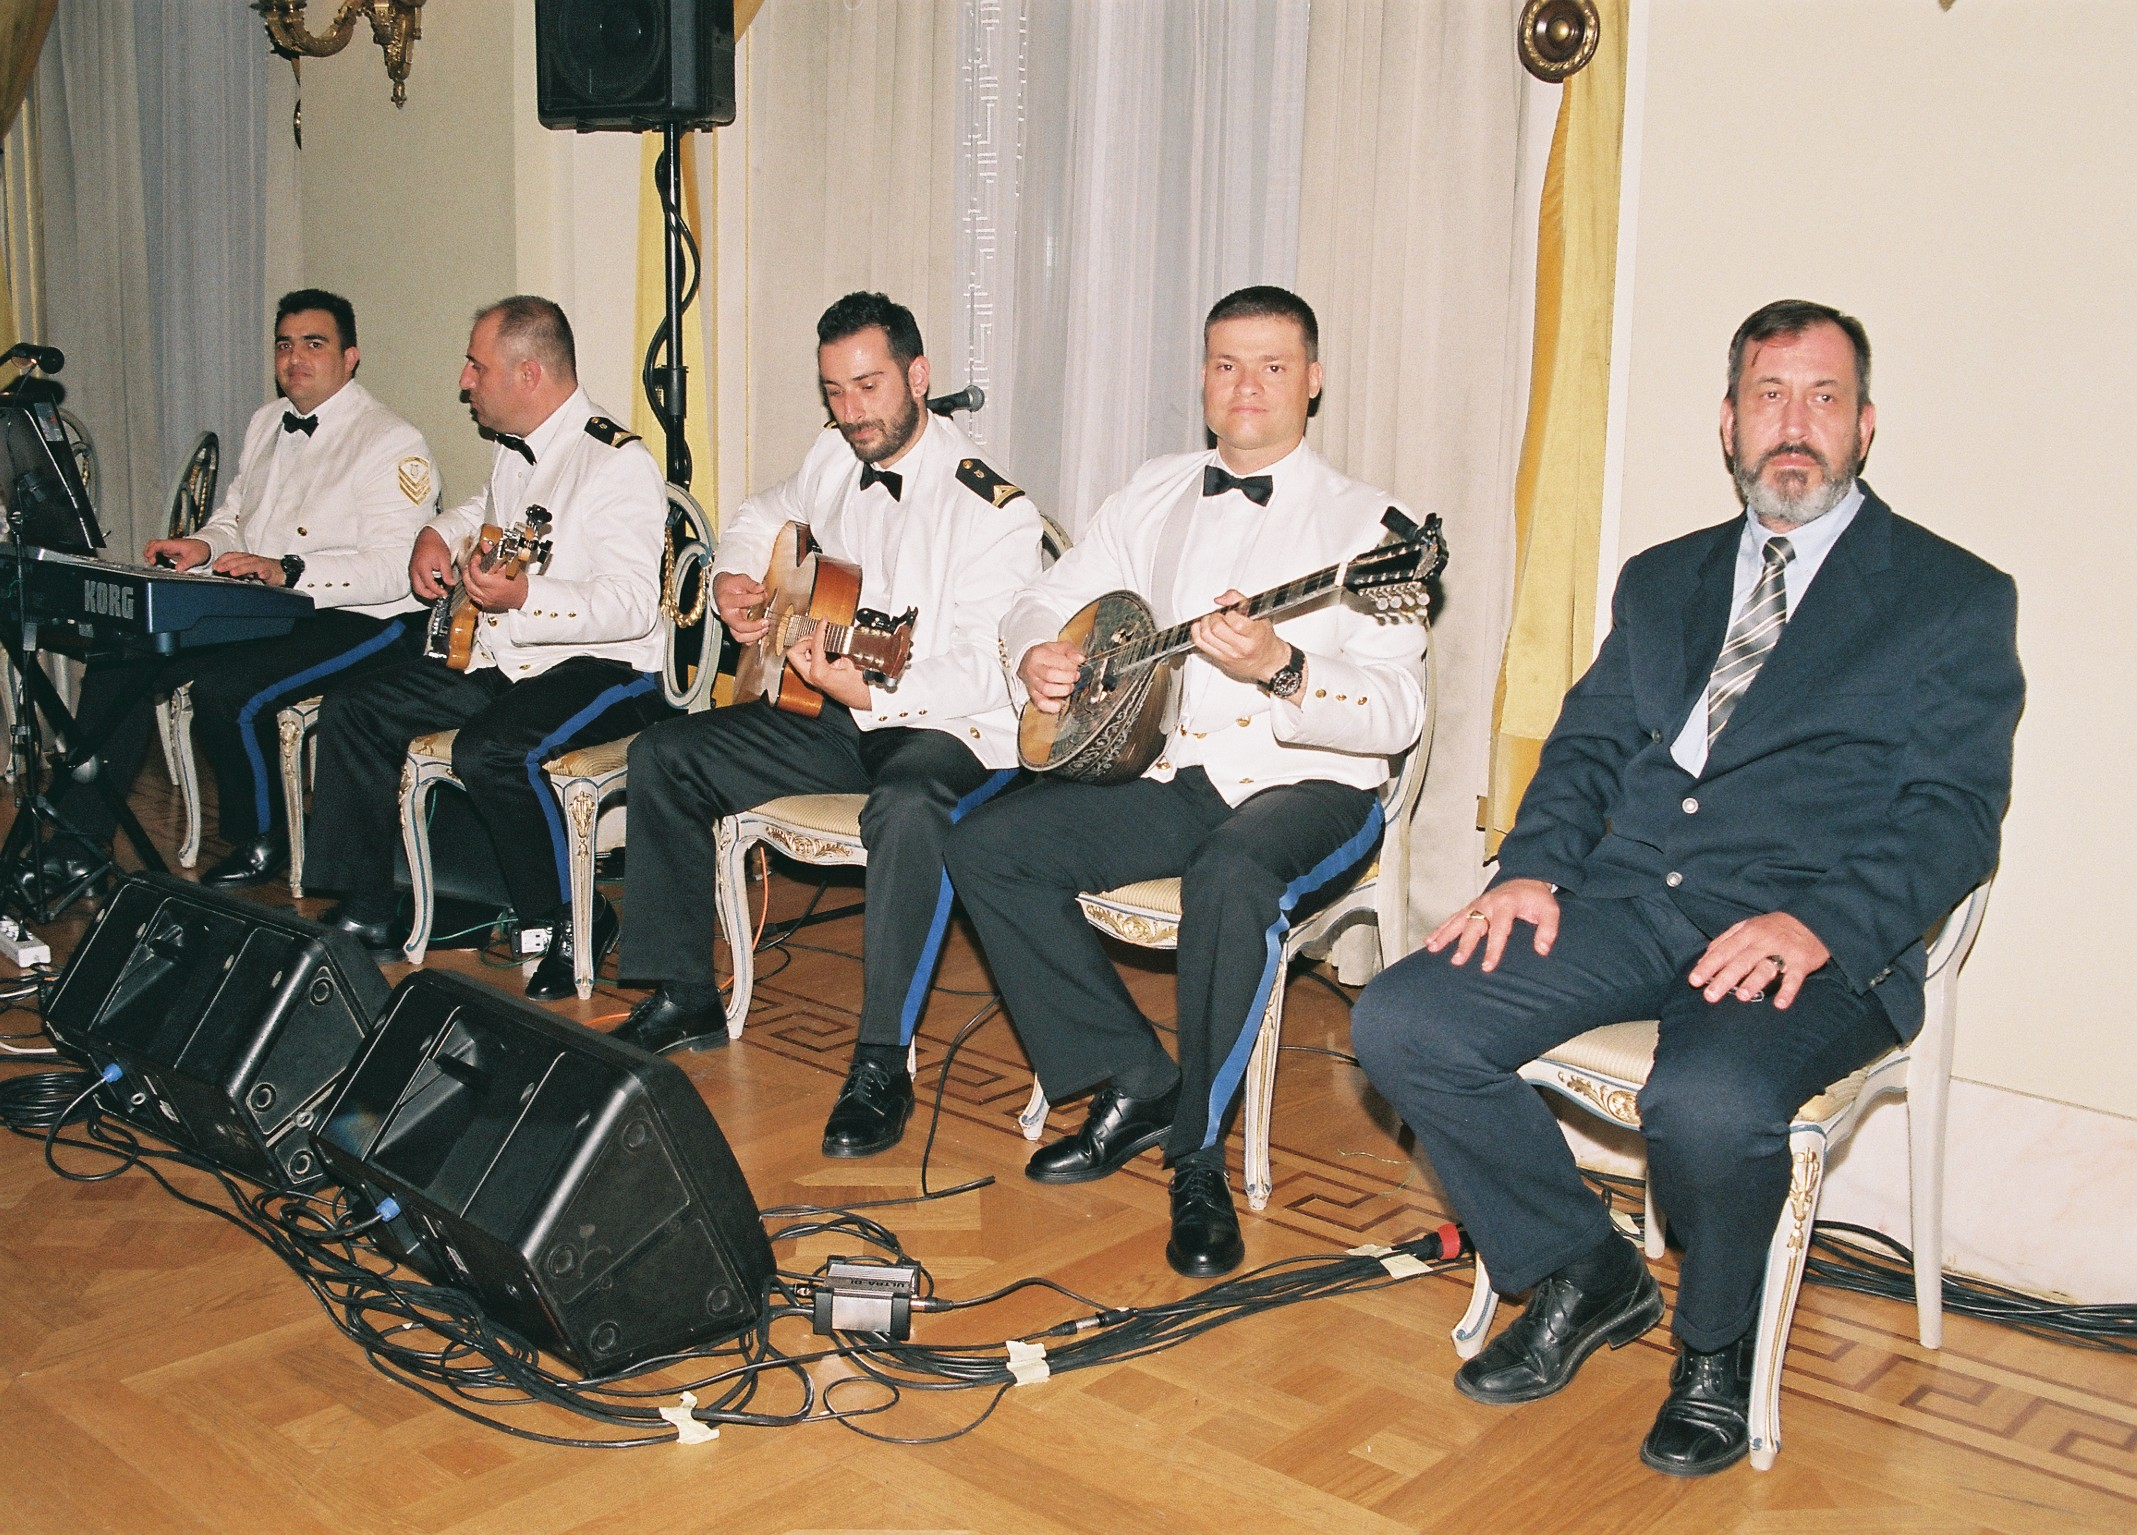 The Light Orchestra of the Hellenic Navy Band, led by Lieutenant Commander Georgios Tsilbaris.